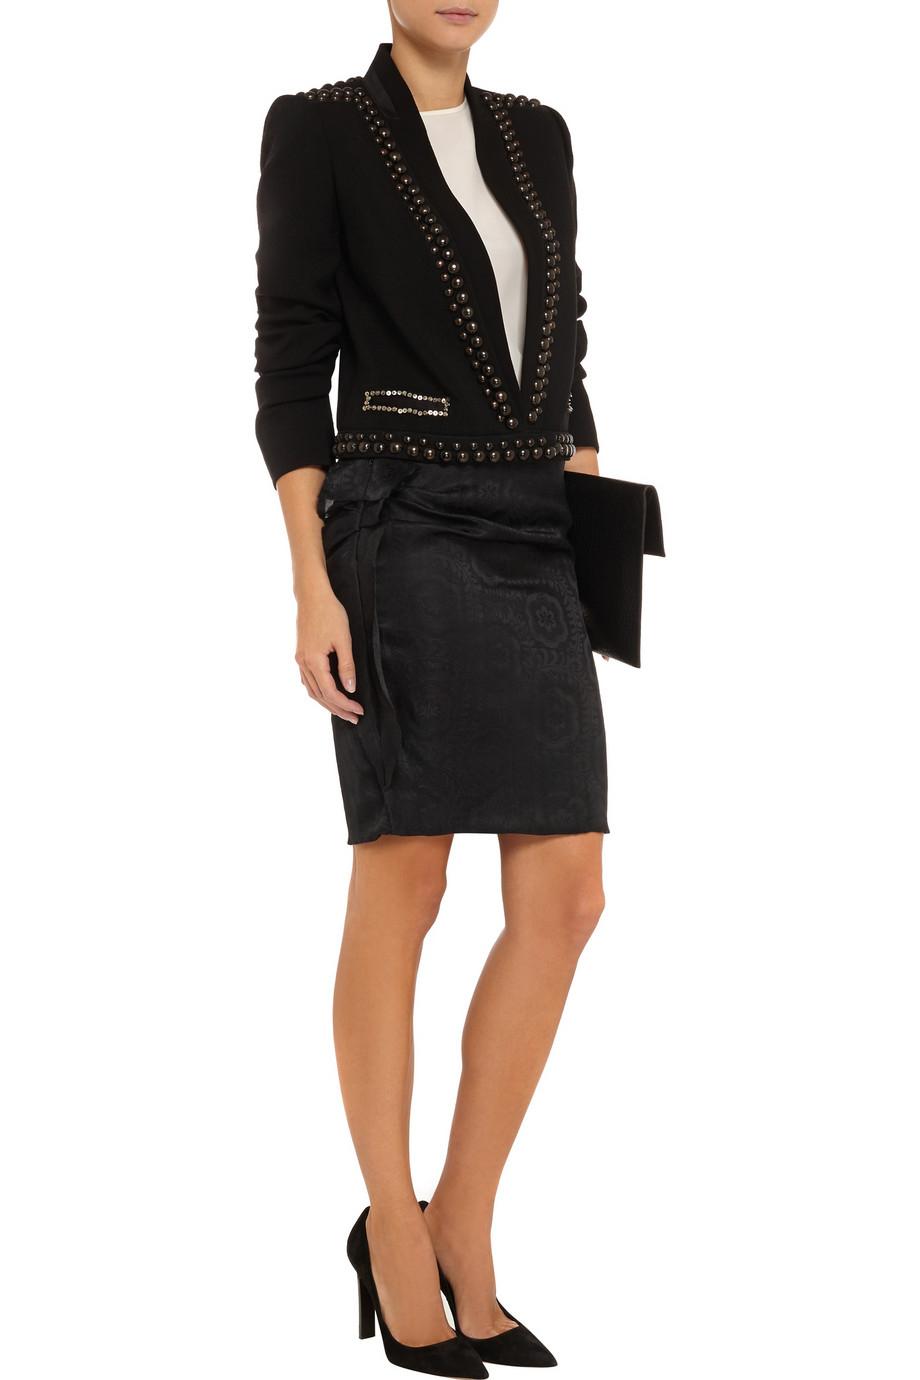 isabel marant kristy ruffled silk jacquard mini skirt in black lyst. Black Bedroom Furniture Sets. Home Design Ideas